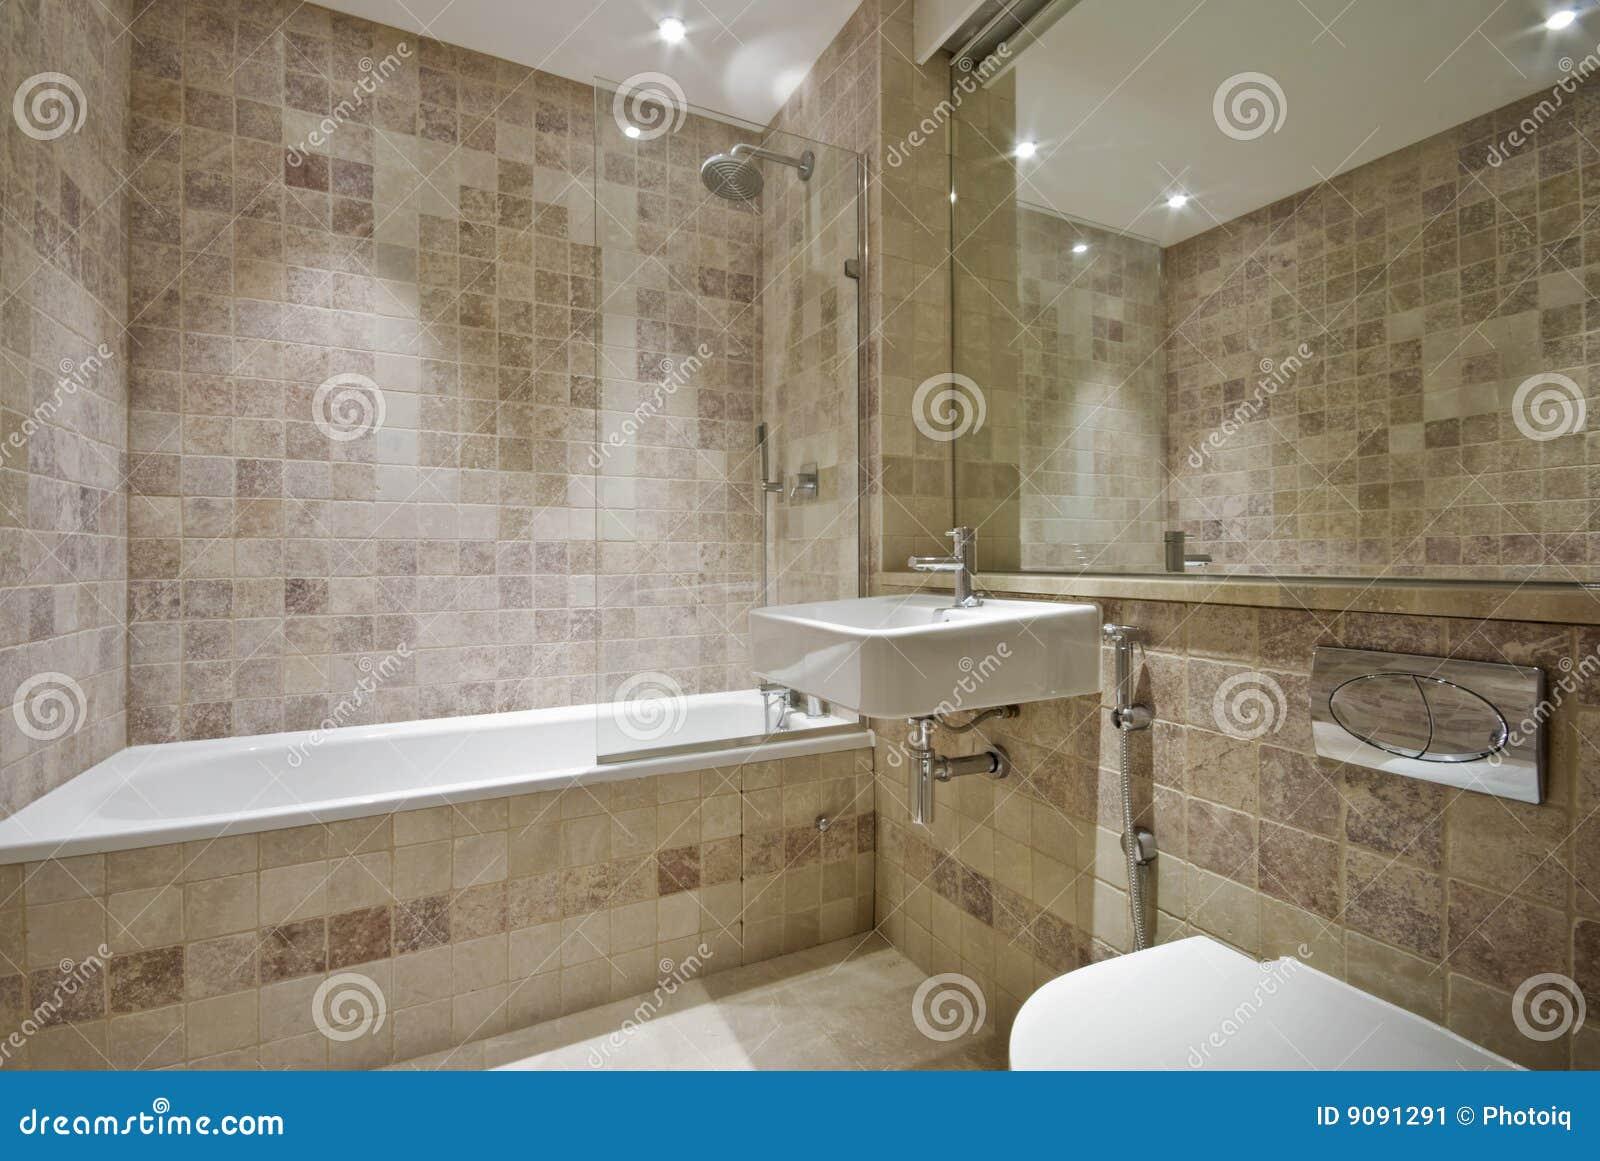 Azulejos Baño Piedra:Natural Stone Bathroom Floors with Tile